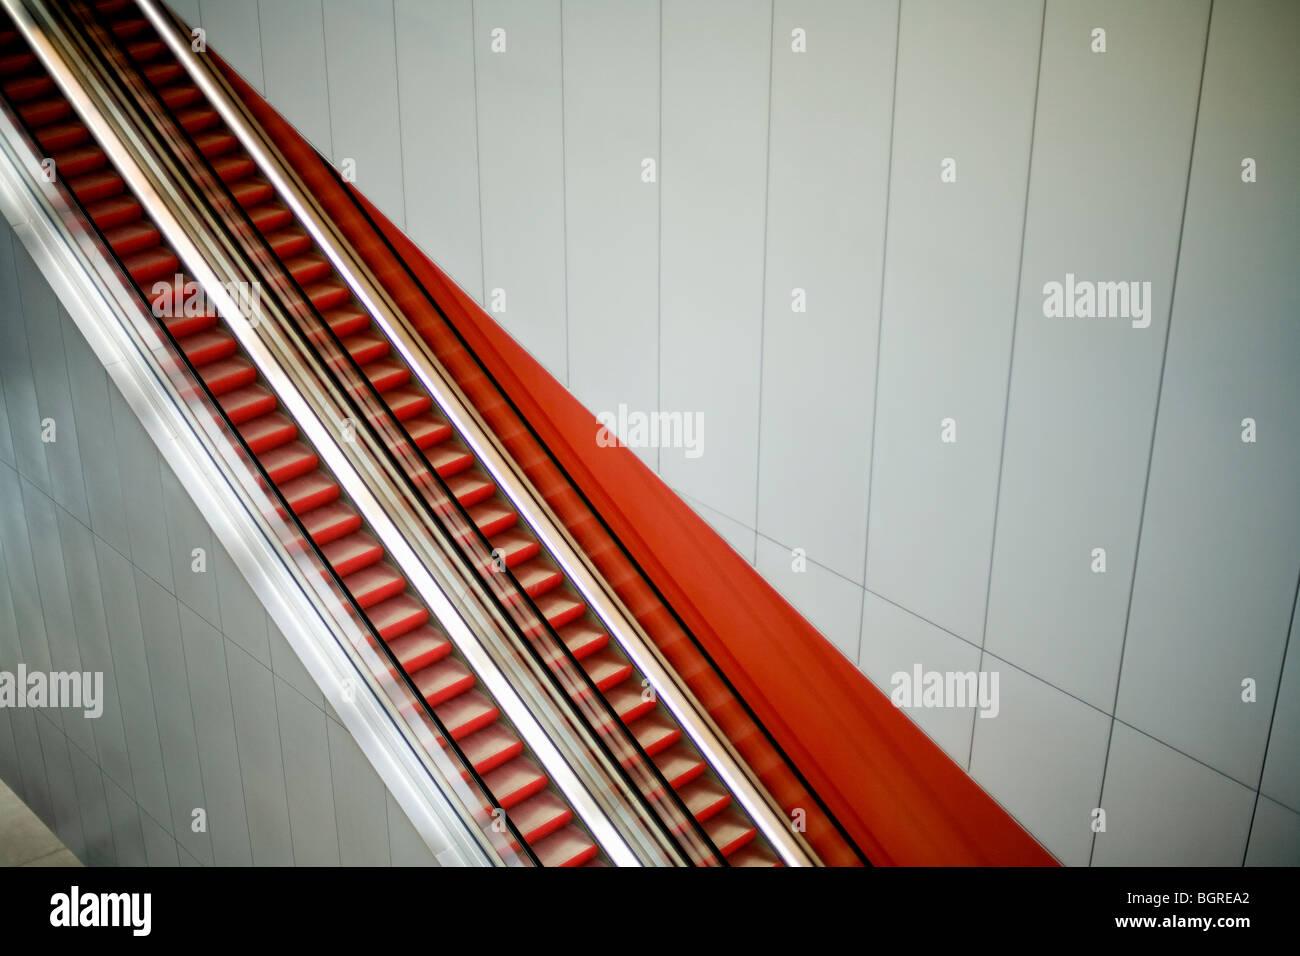 Escalator, Sweden. Stock Photo